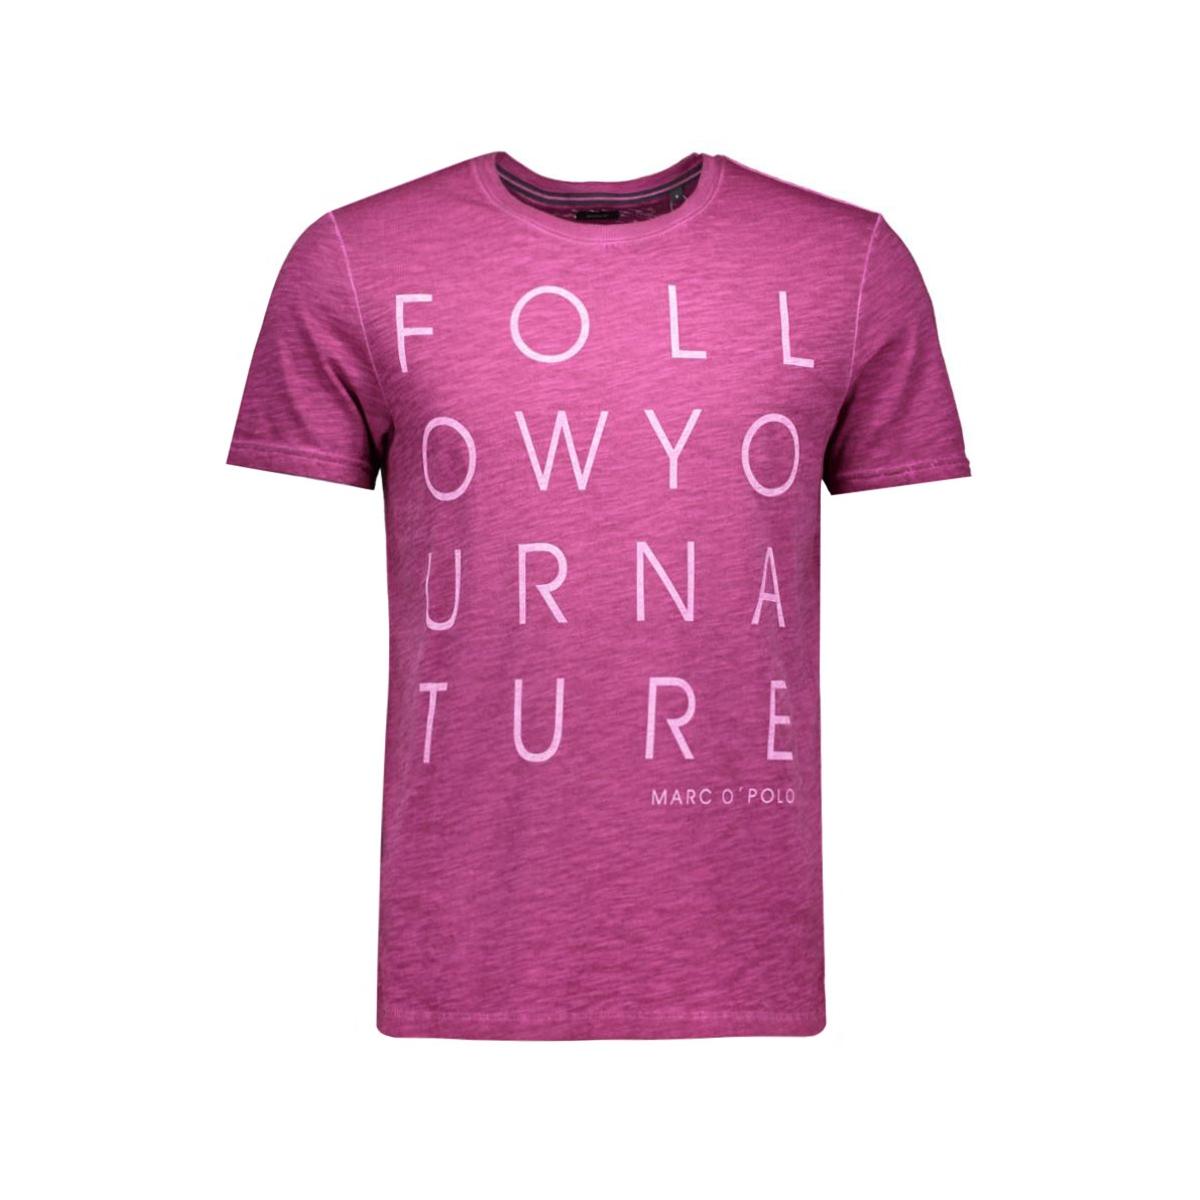 626 2000 51098 marc o`polo t-shirt 386